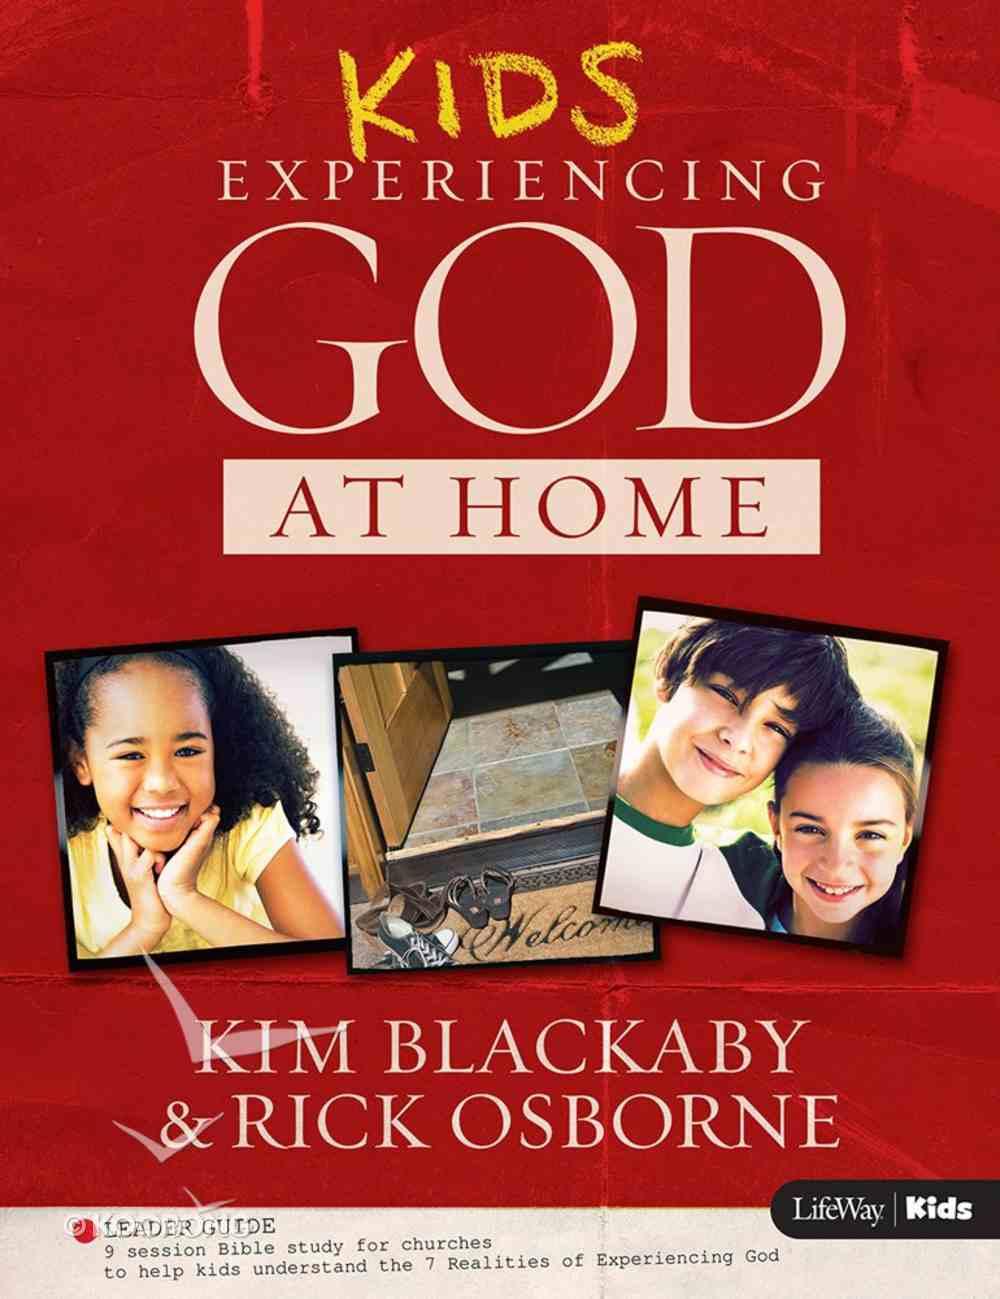 Kids Leader Guide (Kids Experiencing God At Home Series) Paperback